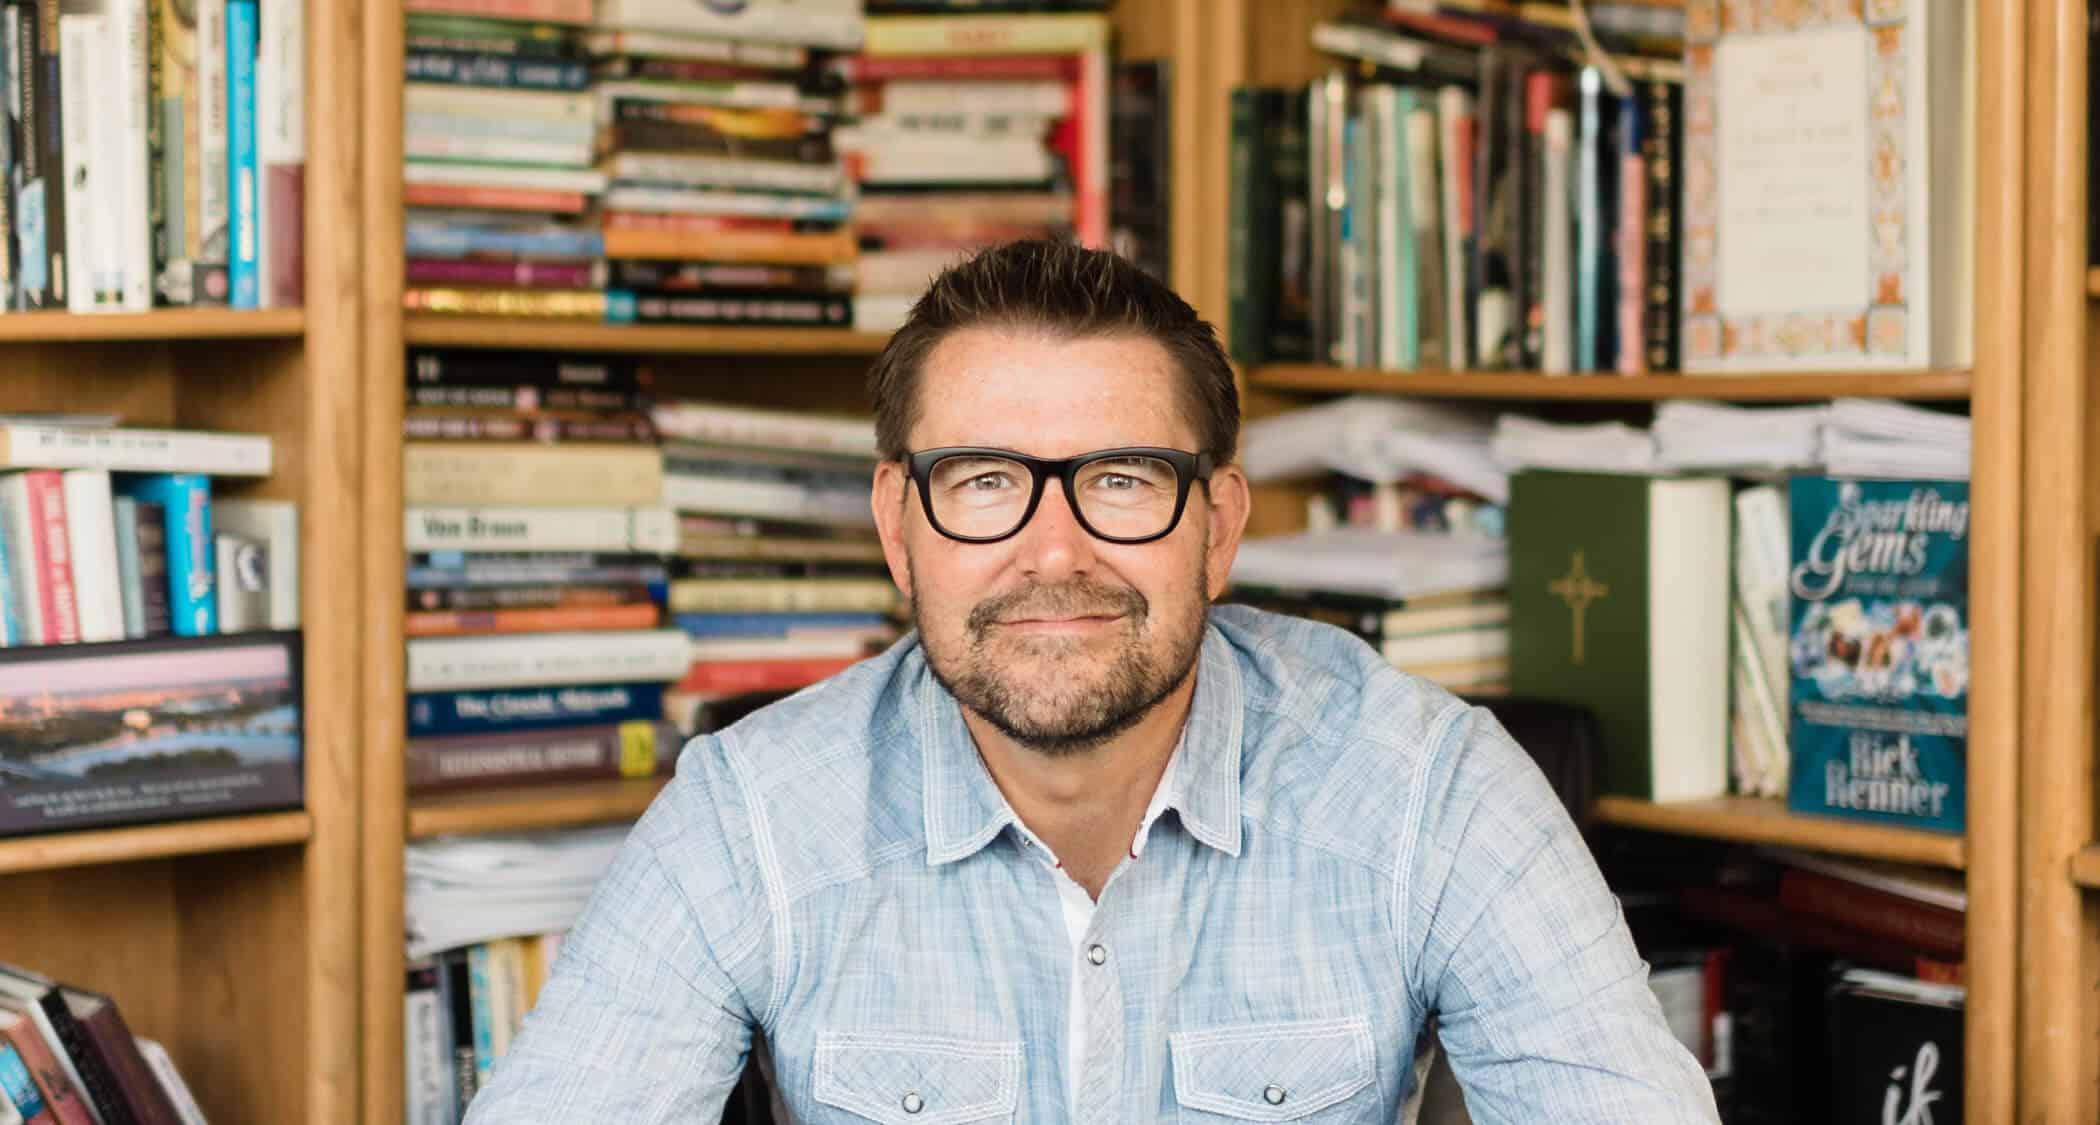 Mark Batterson, a pastor and an alumnus of Regent University's School of Divinity.